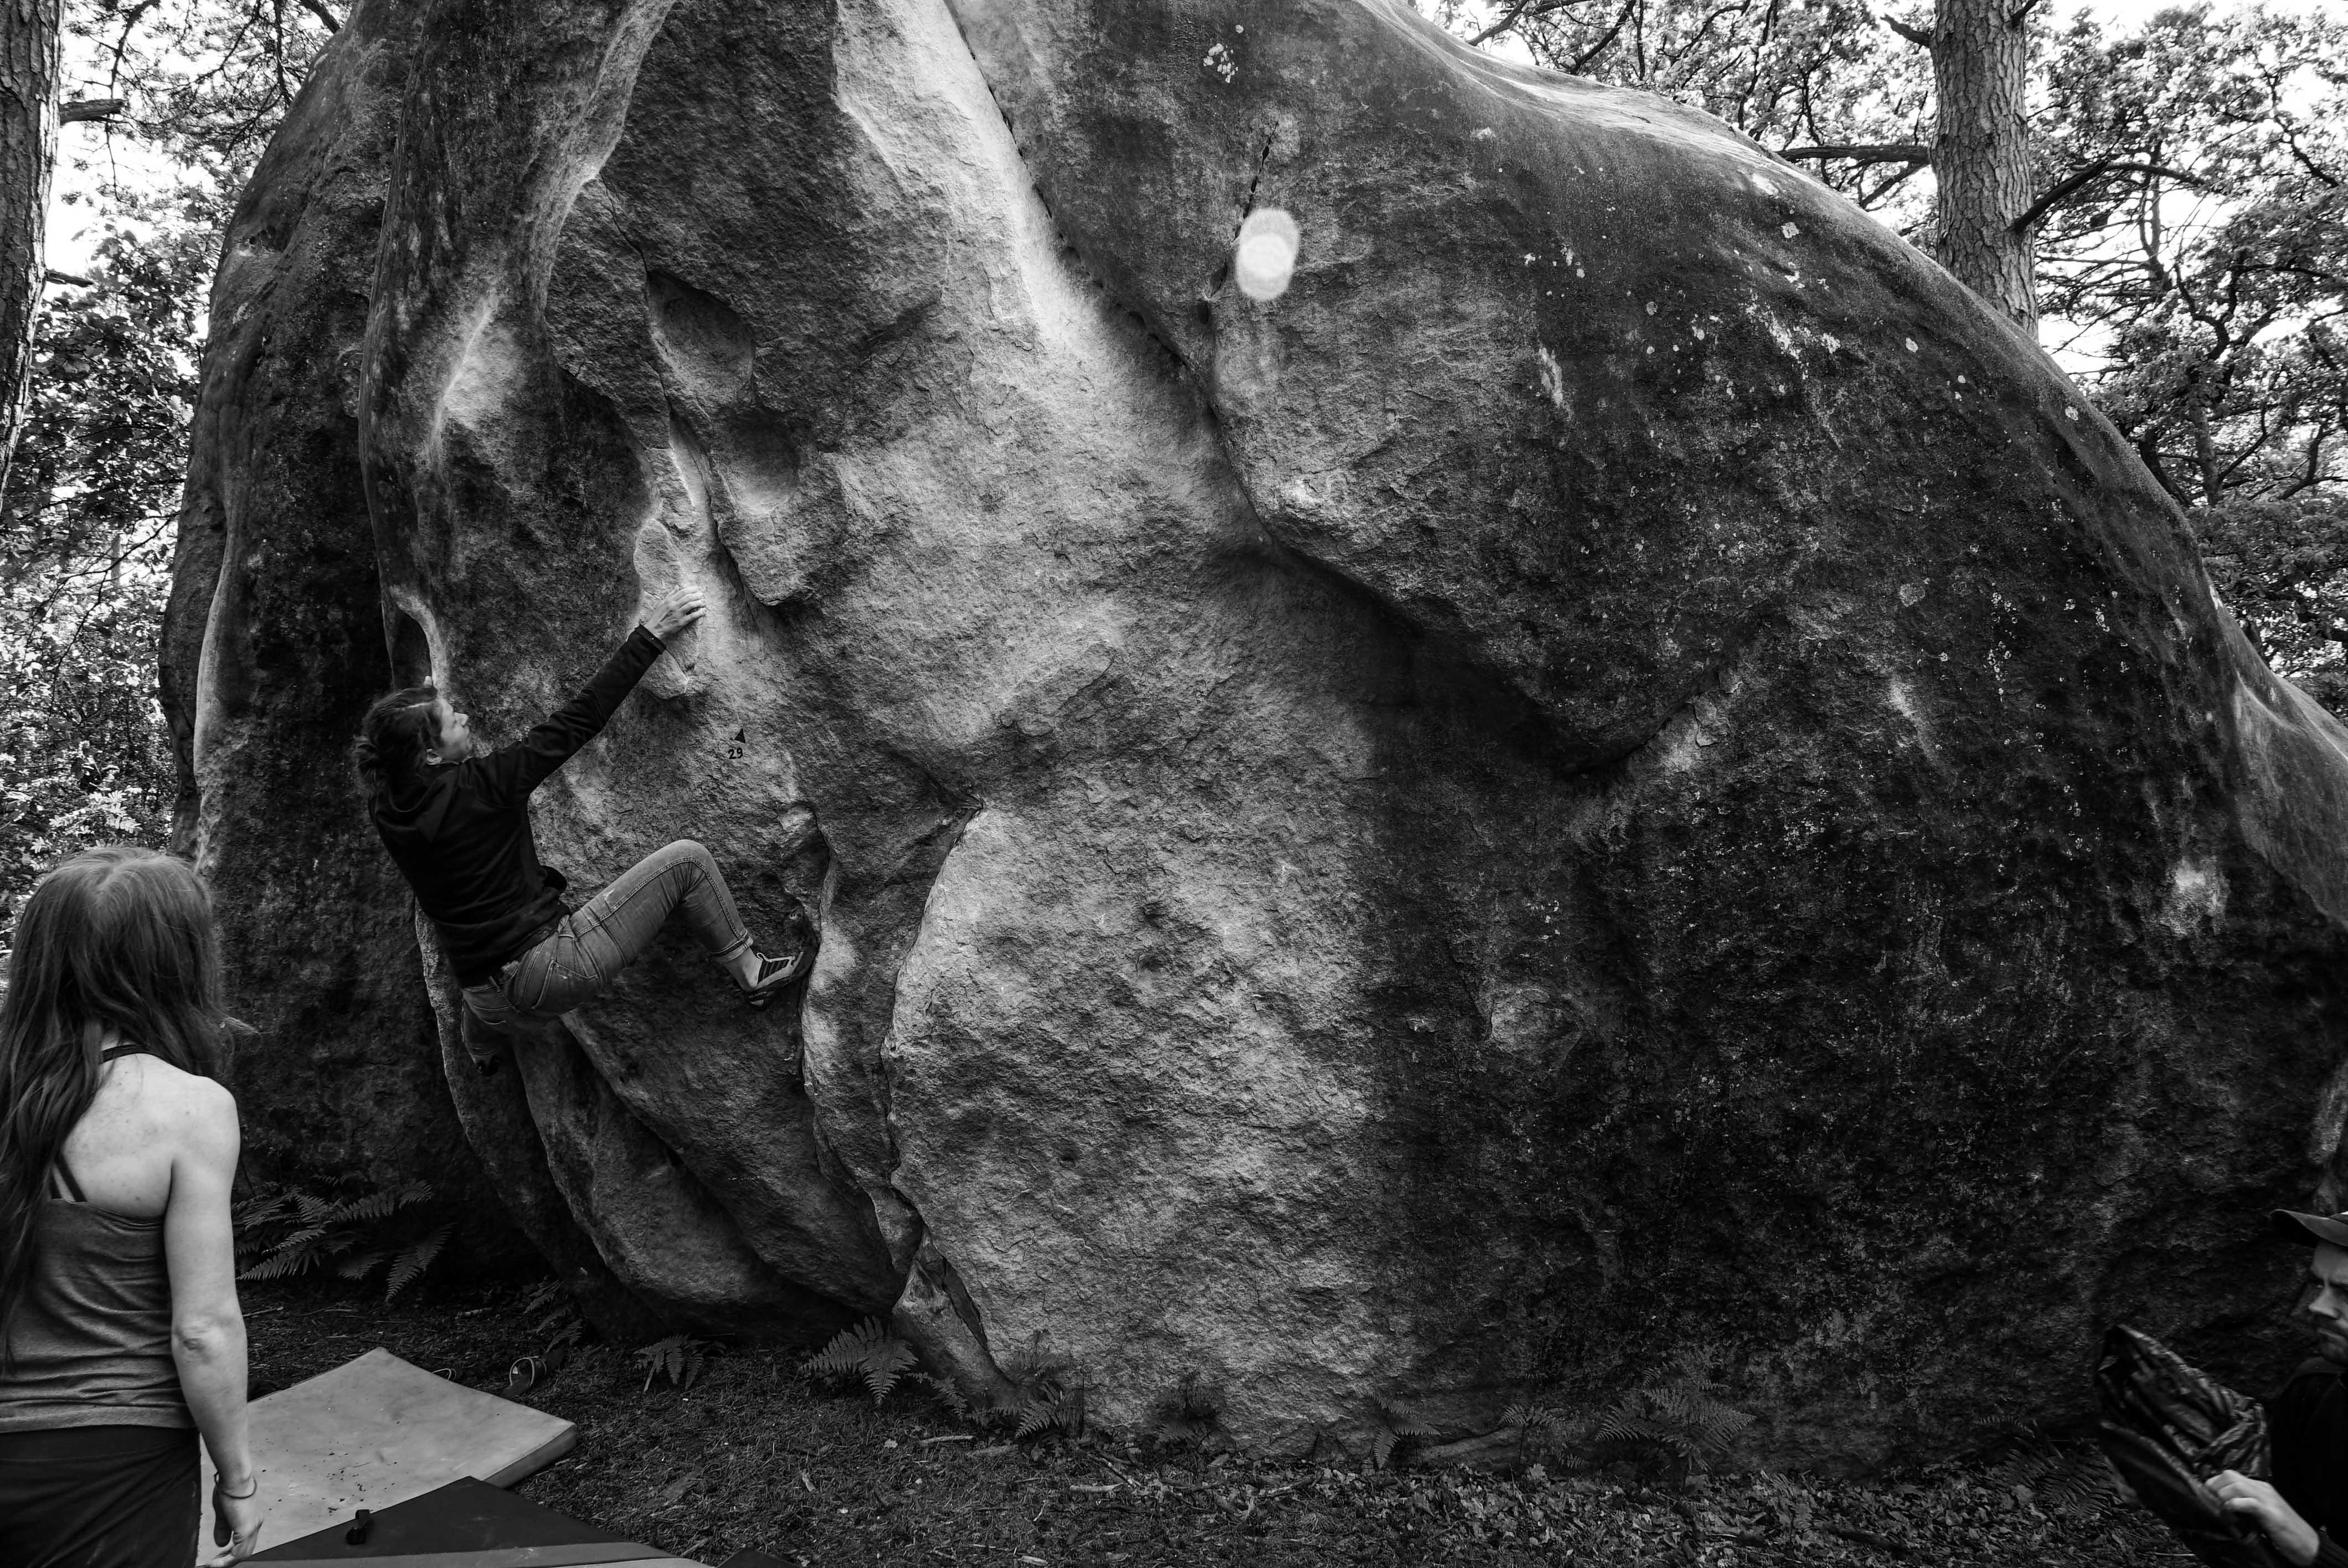 fontainbleau climbing 2016 mike brindley-126